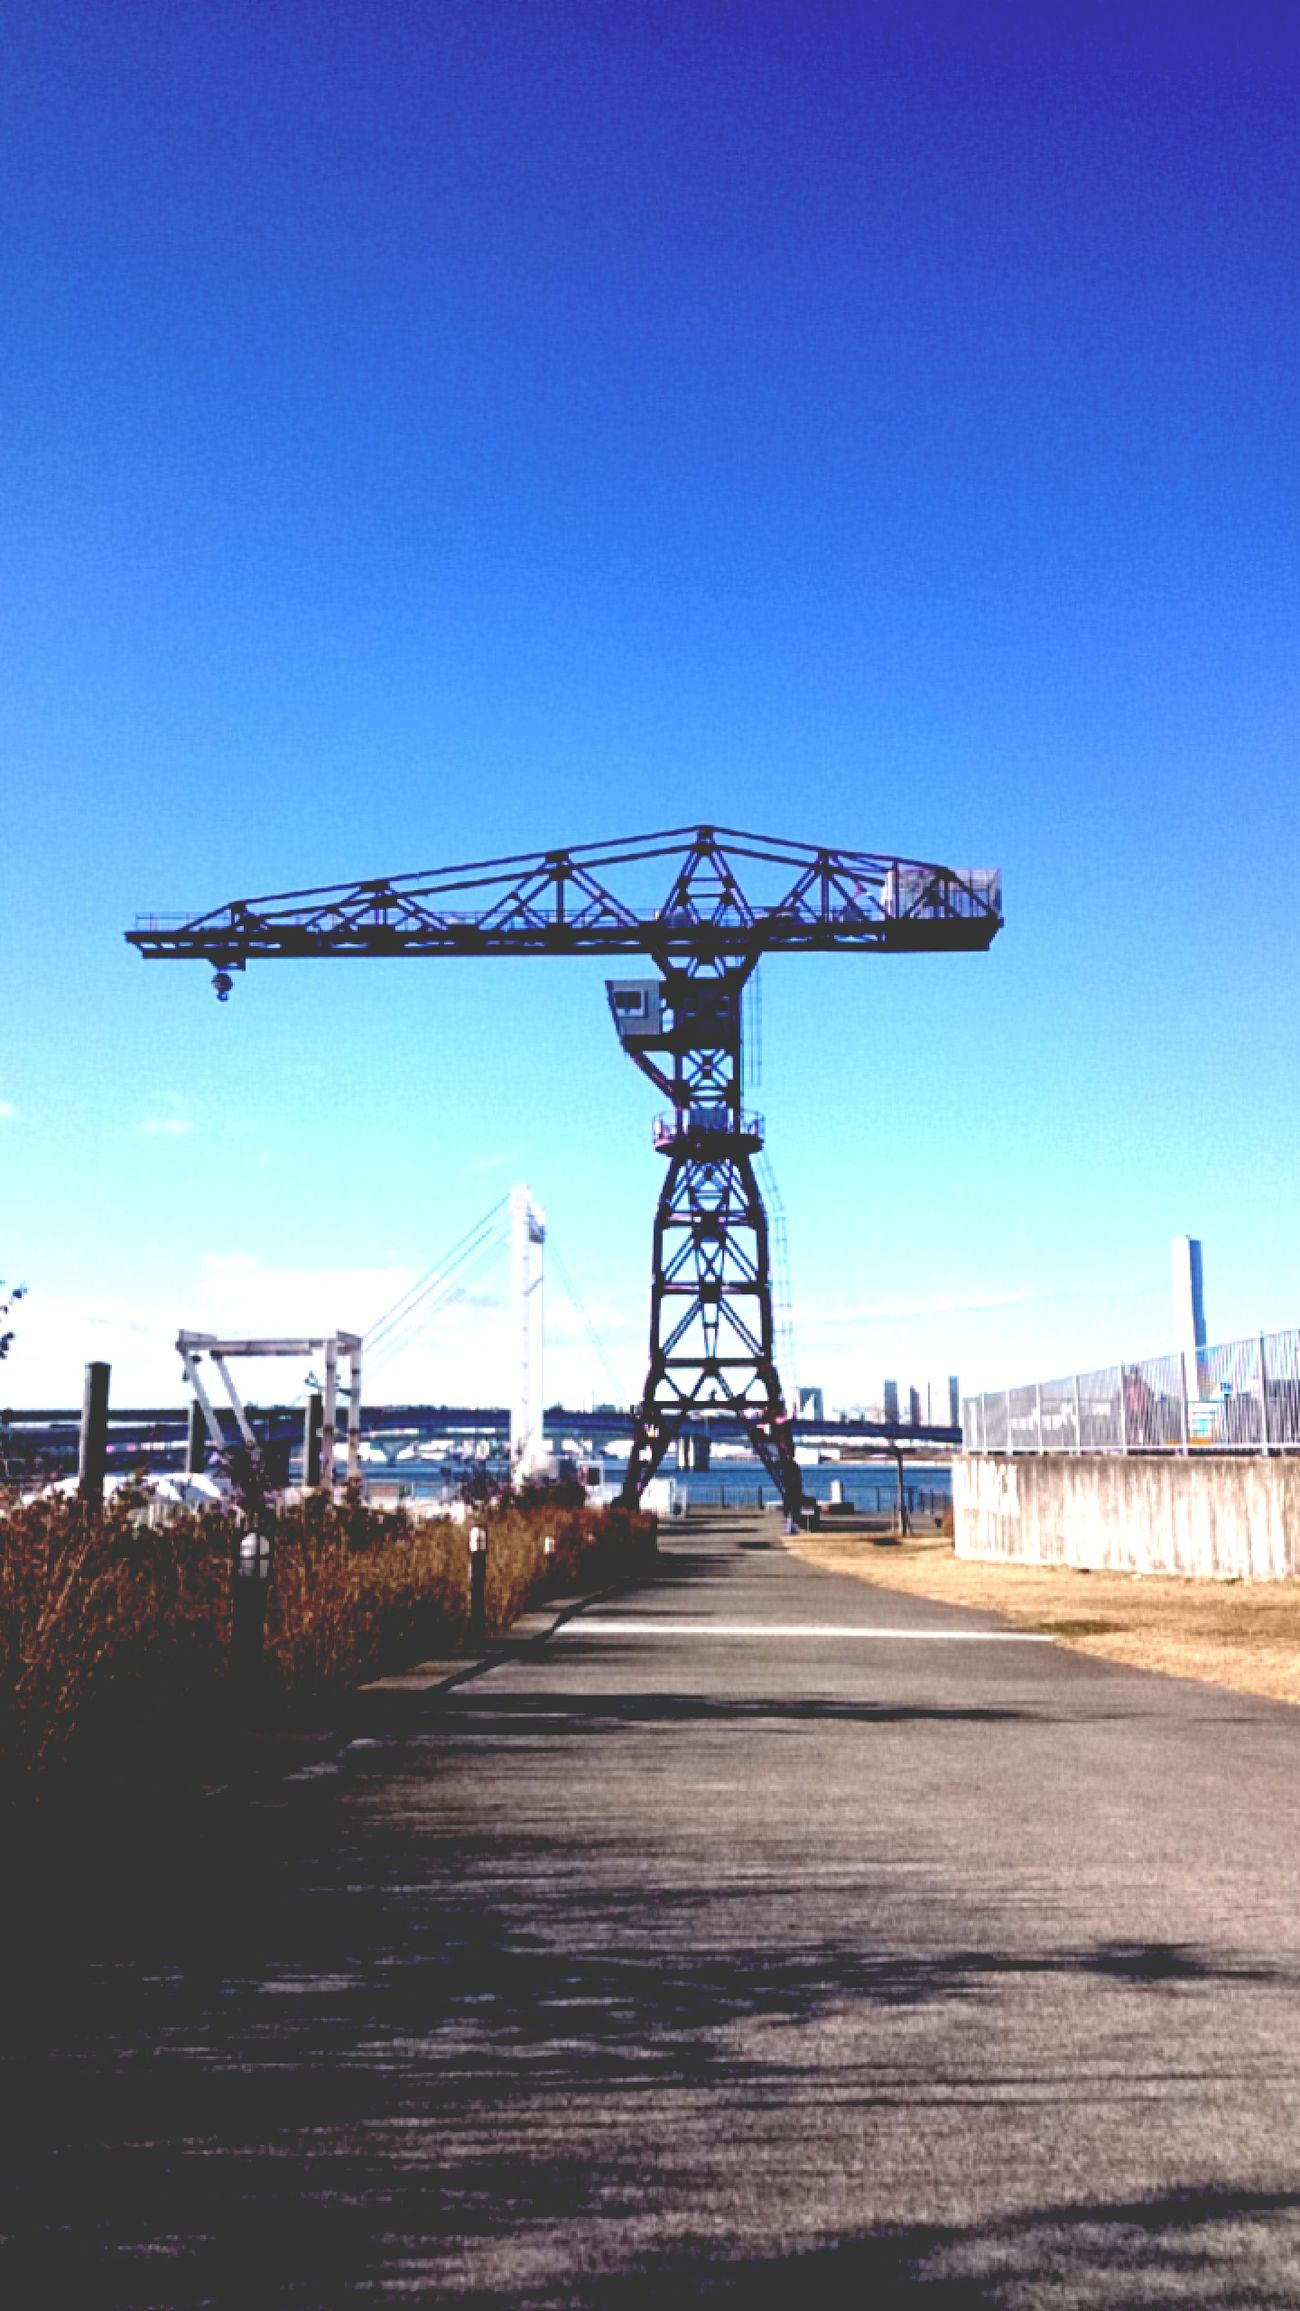 Sky Clear Sky No People Outdoors Industry Day Sea Side Tokyo,Japan Toyosu Crane - Construction Machinery Crane